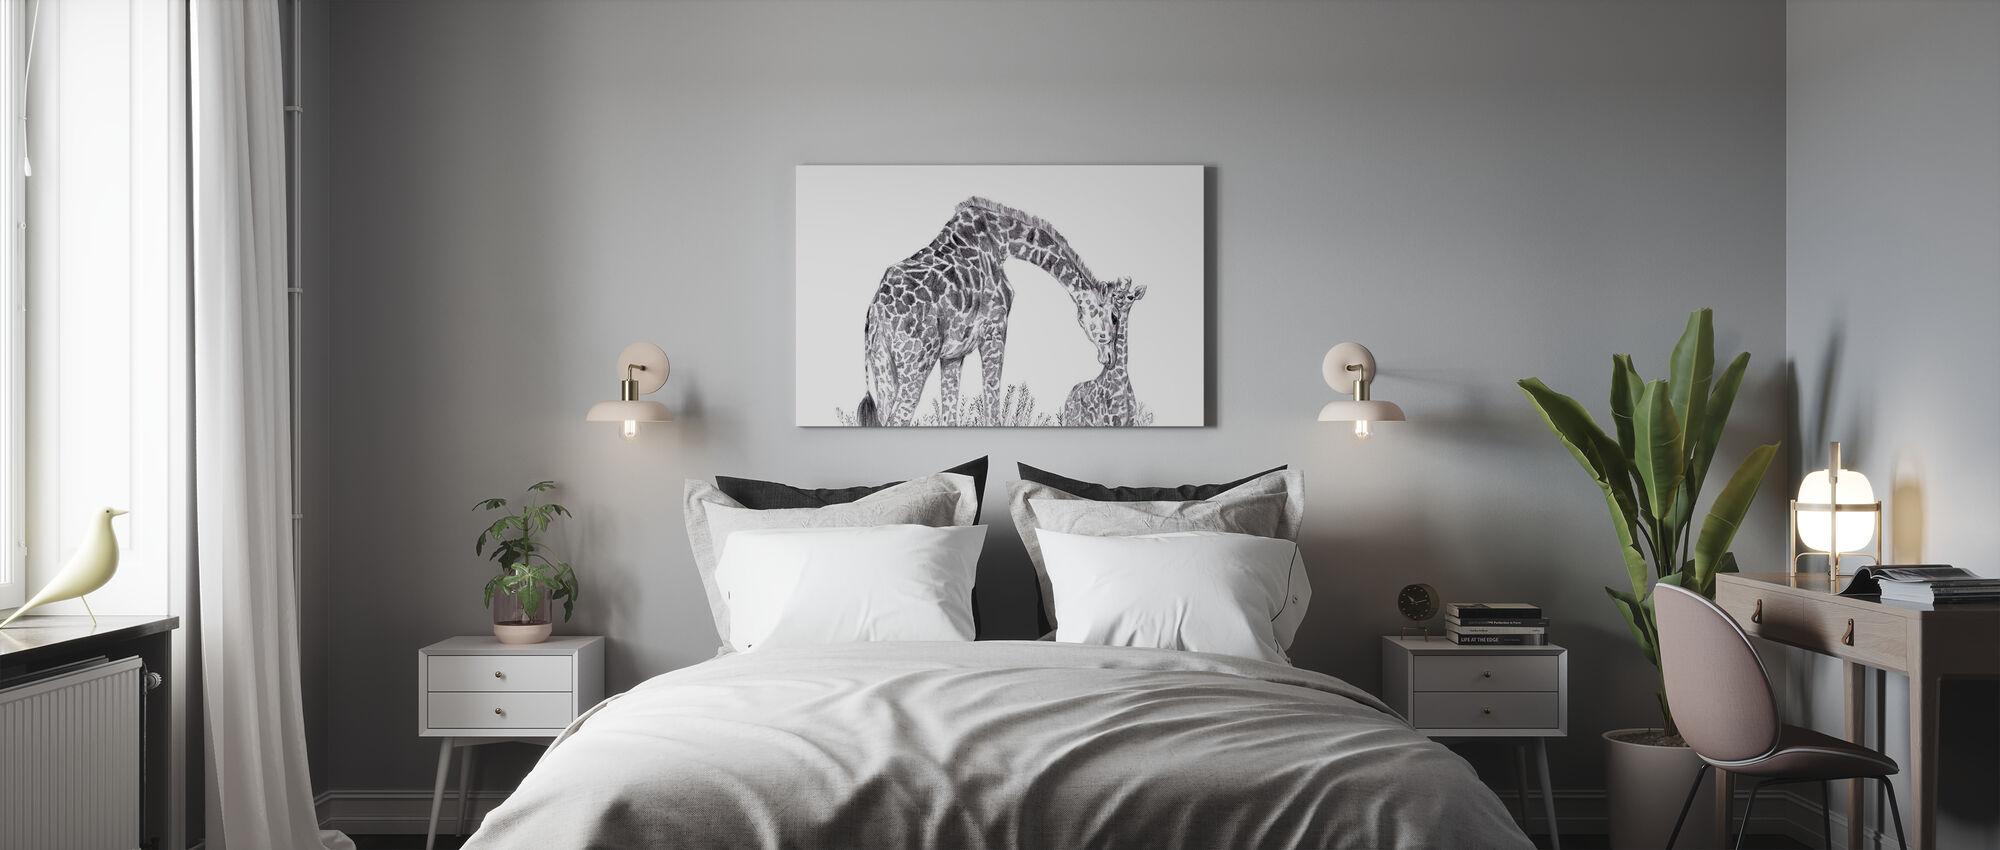 New Beginnings II - Canvas print - Bedroom